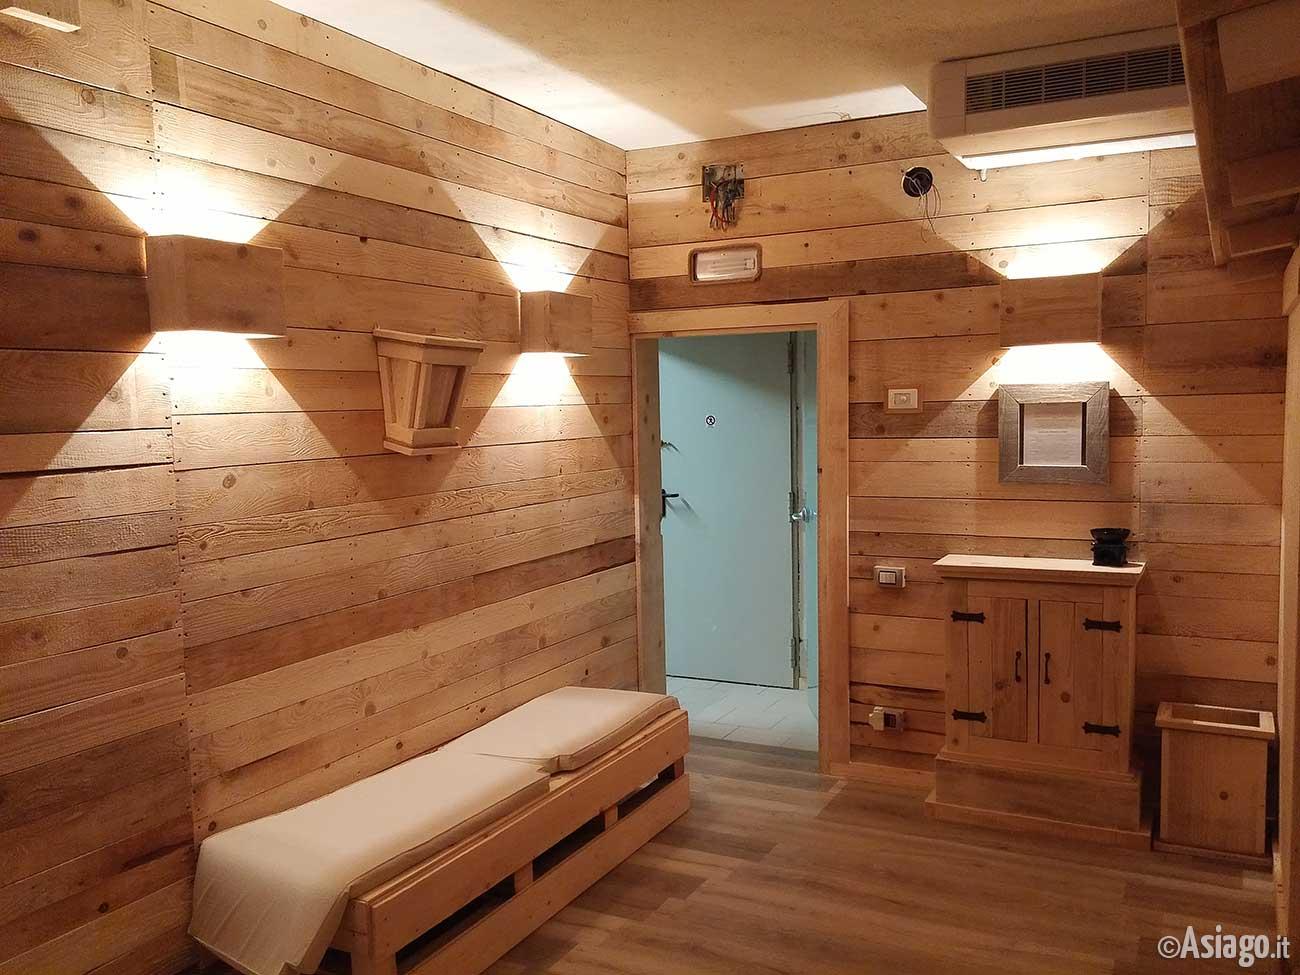 Cesuna foto casa zeleghe altopiano di asiago 7 comuni - Sauna casa prezzi ...